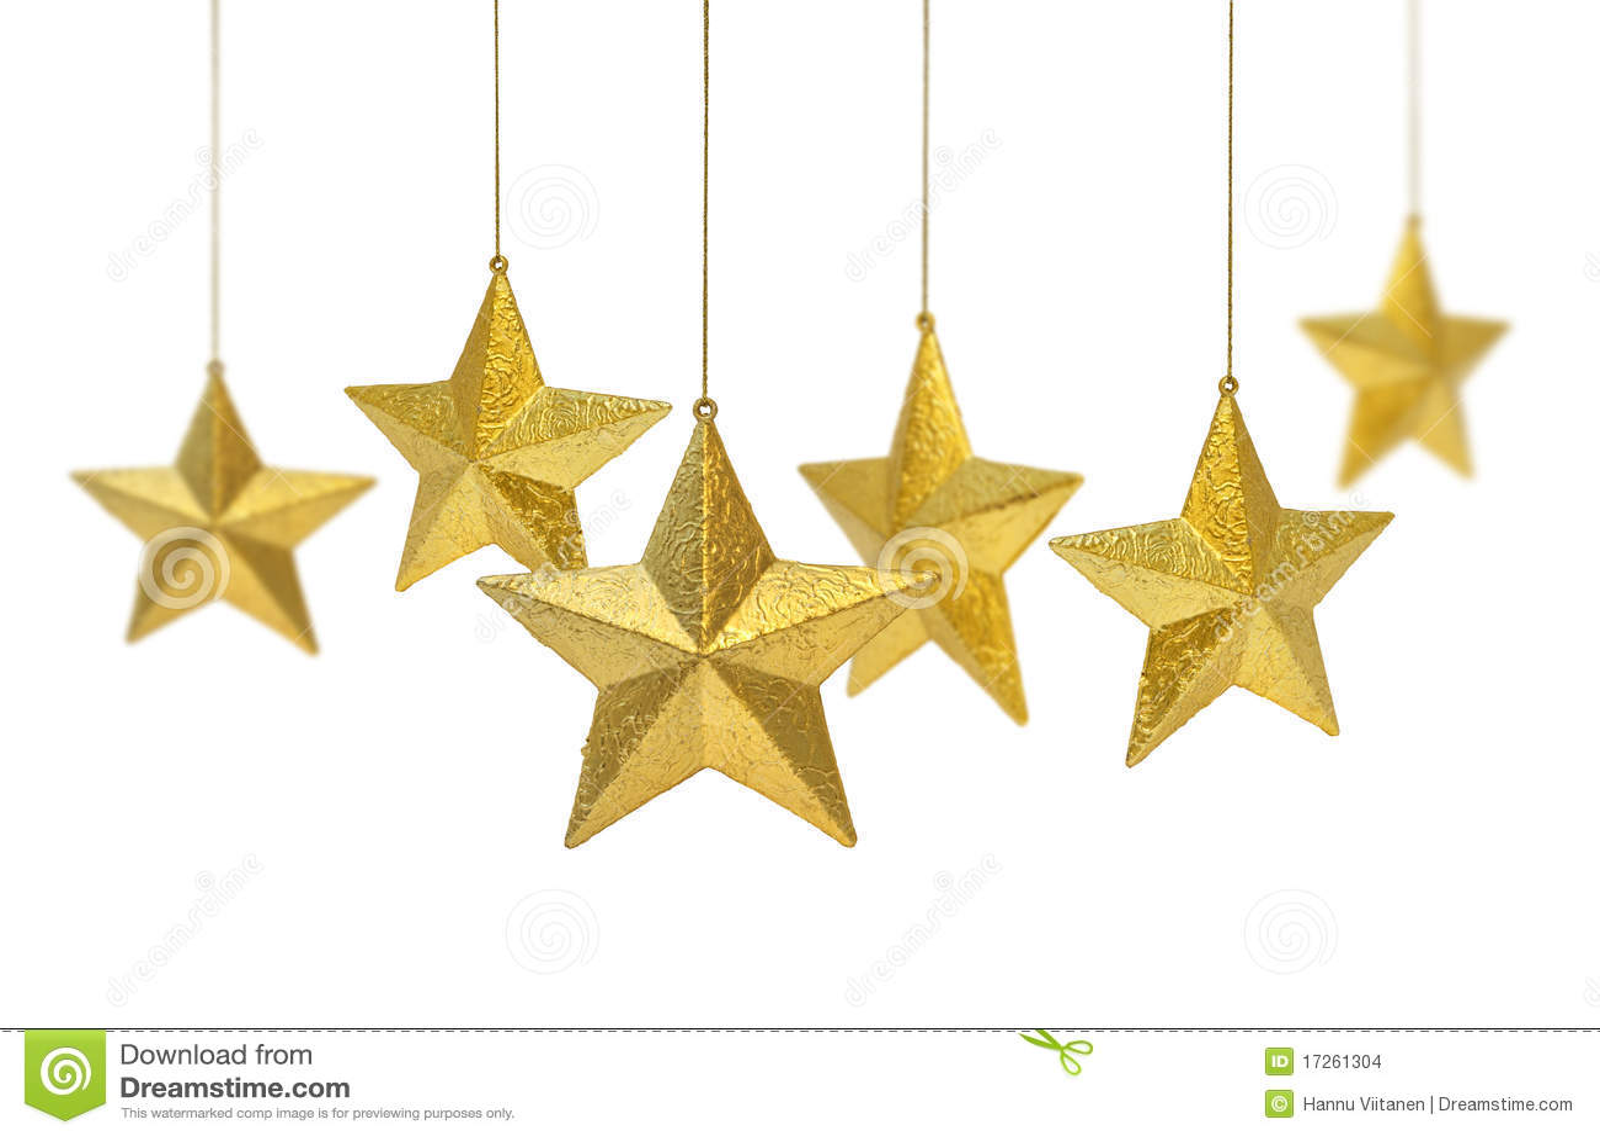 Golden Christmas decoration stars hanging isolated on white background ...